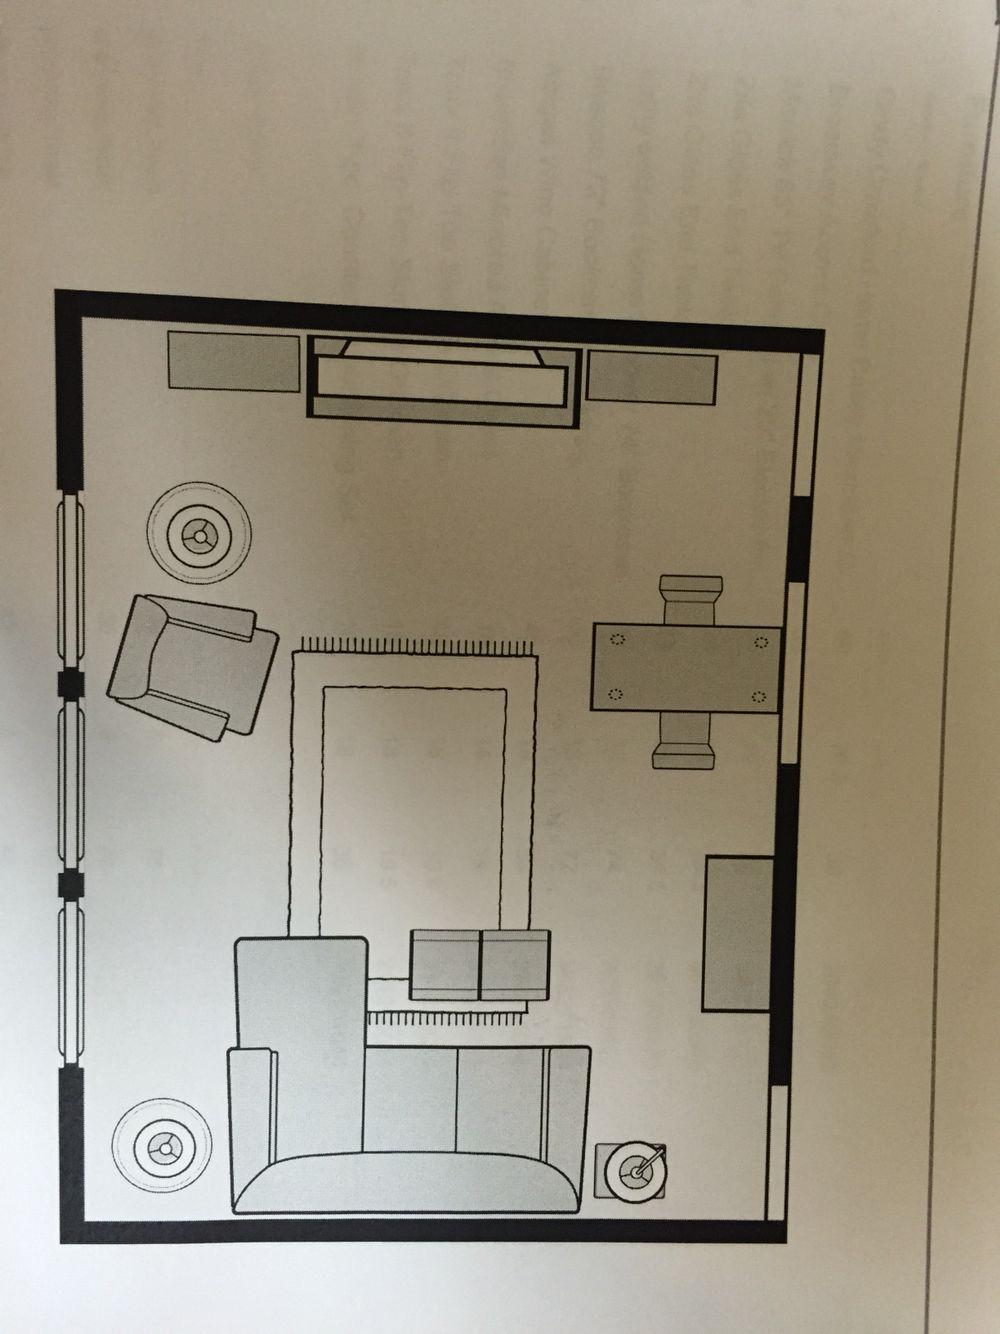 14x18 Living Room Design Living Room Designs Design Room Design